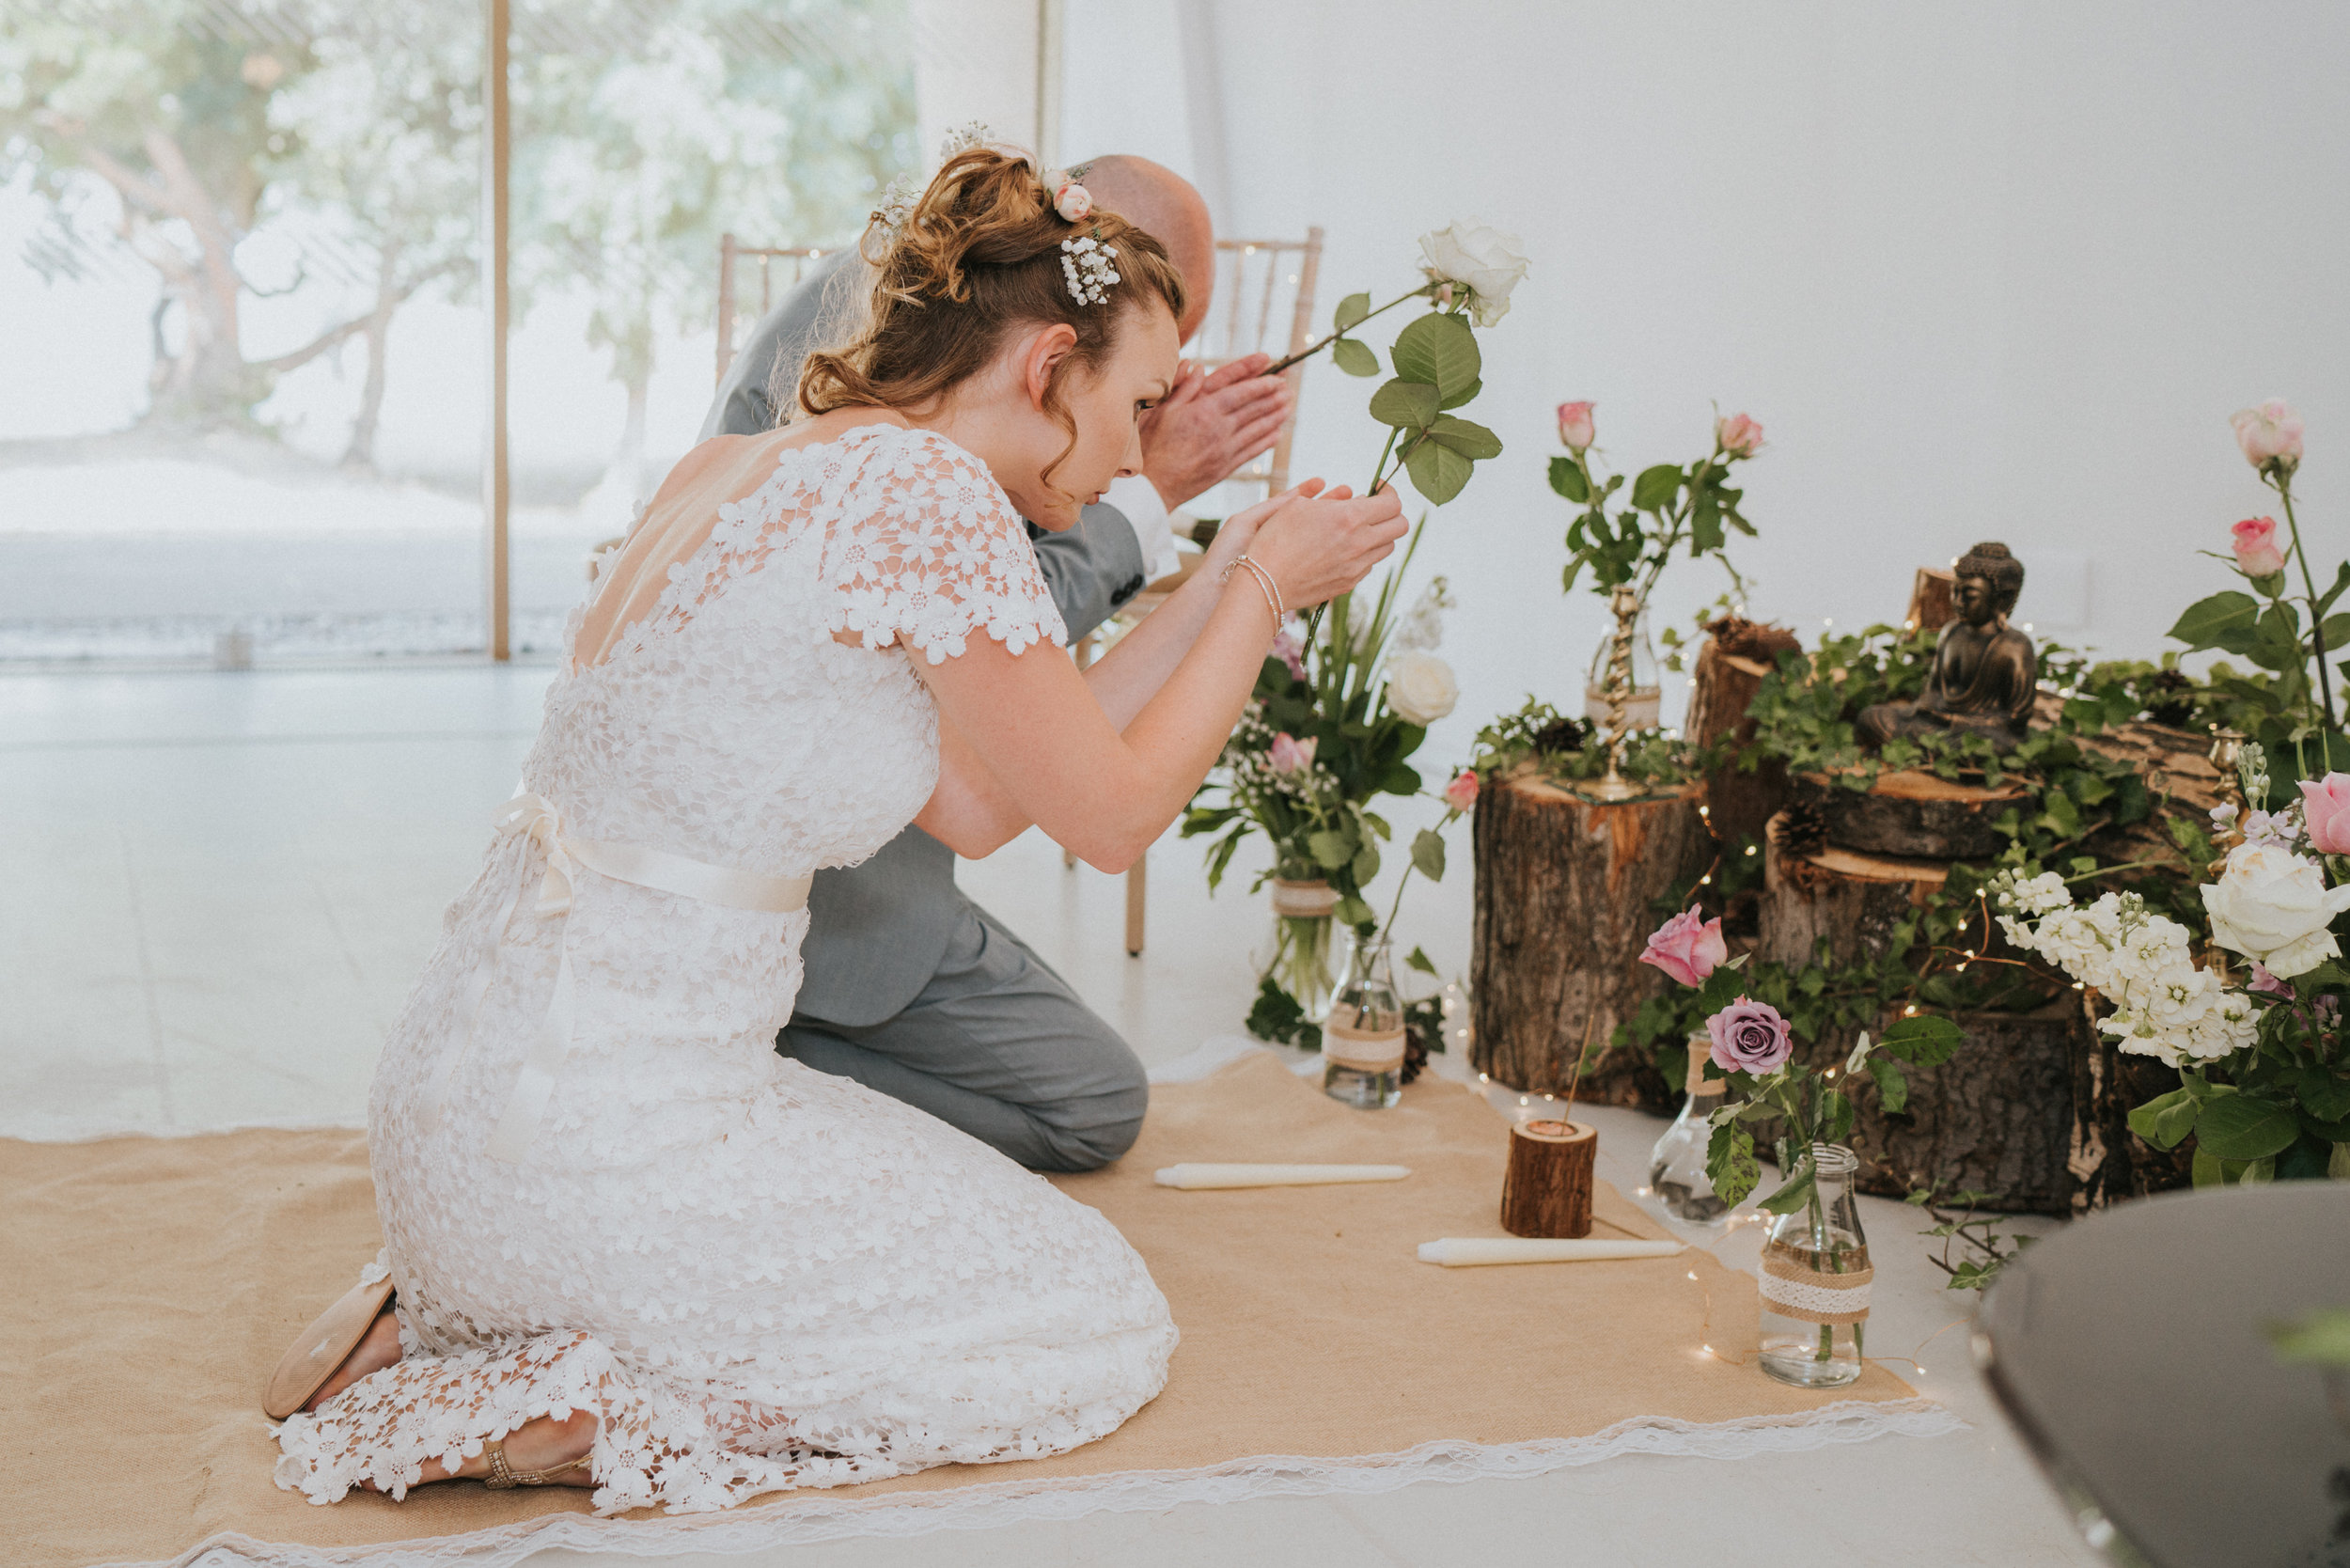 Grace-Elizabeth-Georgie-Amalaketu-Firstsite-Colchester-Essex-Boho-Buddhist-Wedding-Alternative-Wedding-Photography-Essex (50 of 100).jpg